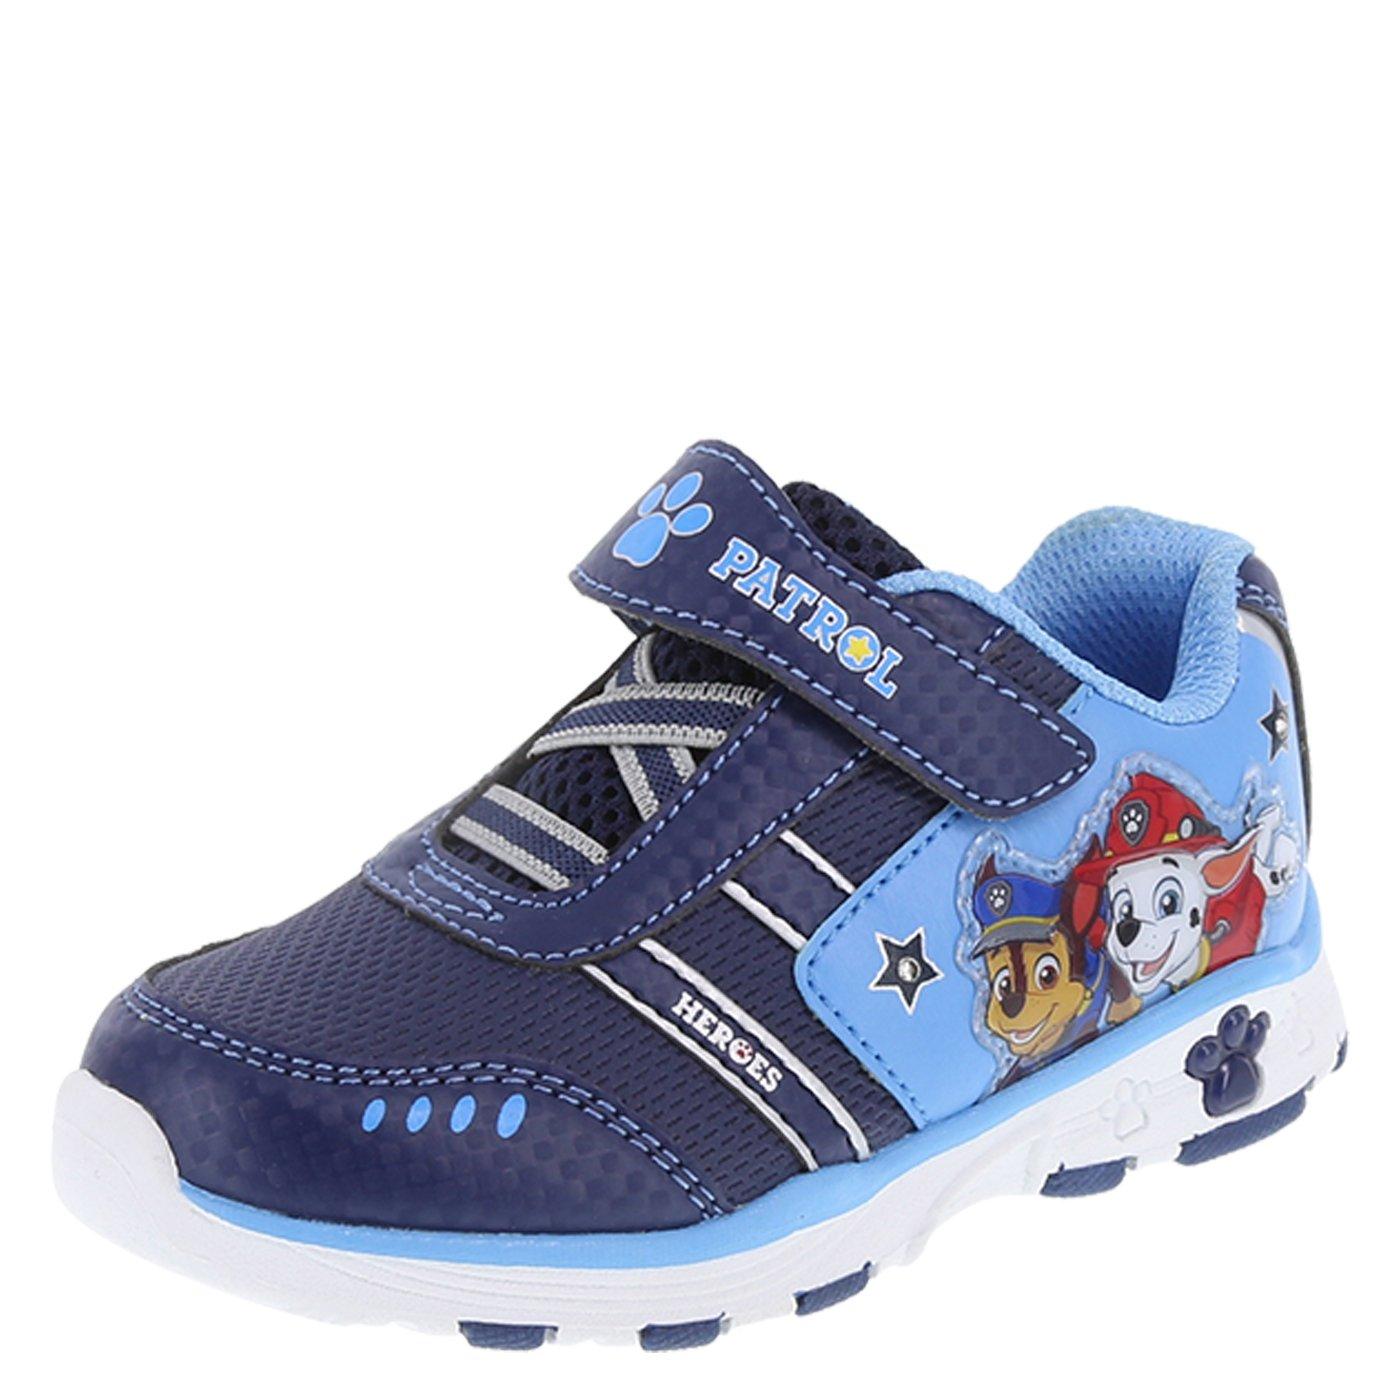 Paw Patrol Nickelodeon Boys' Toddler Lighted Runner 079422-Parent